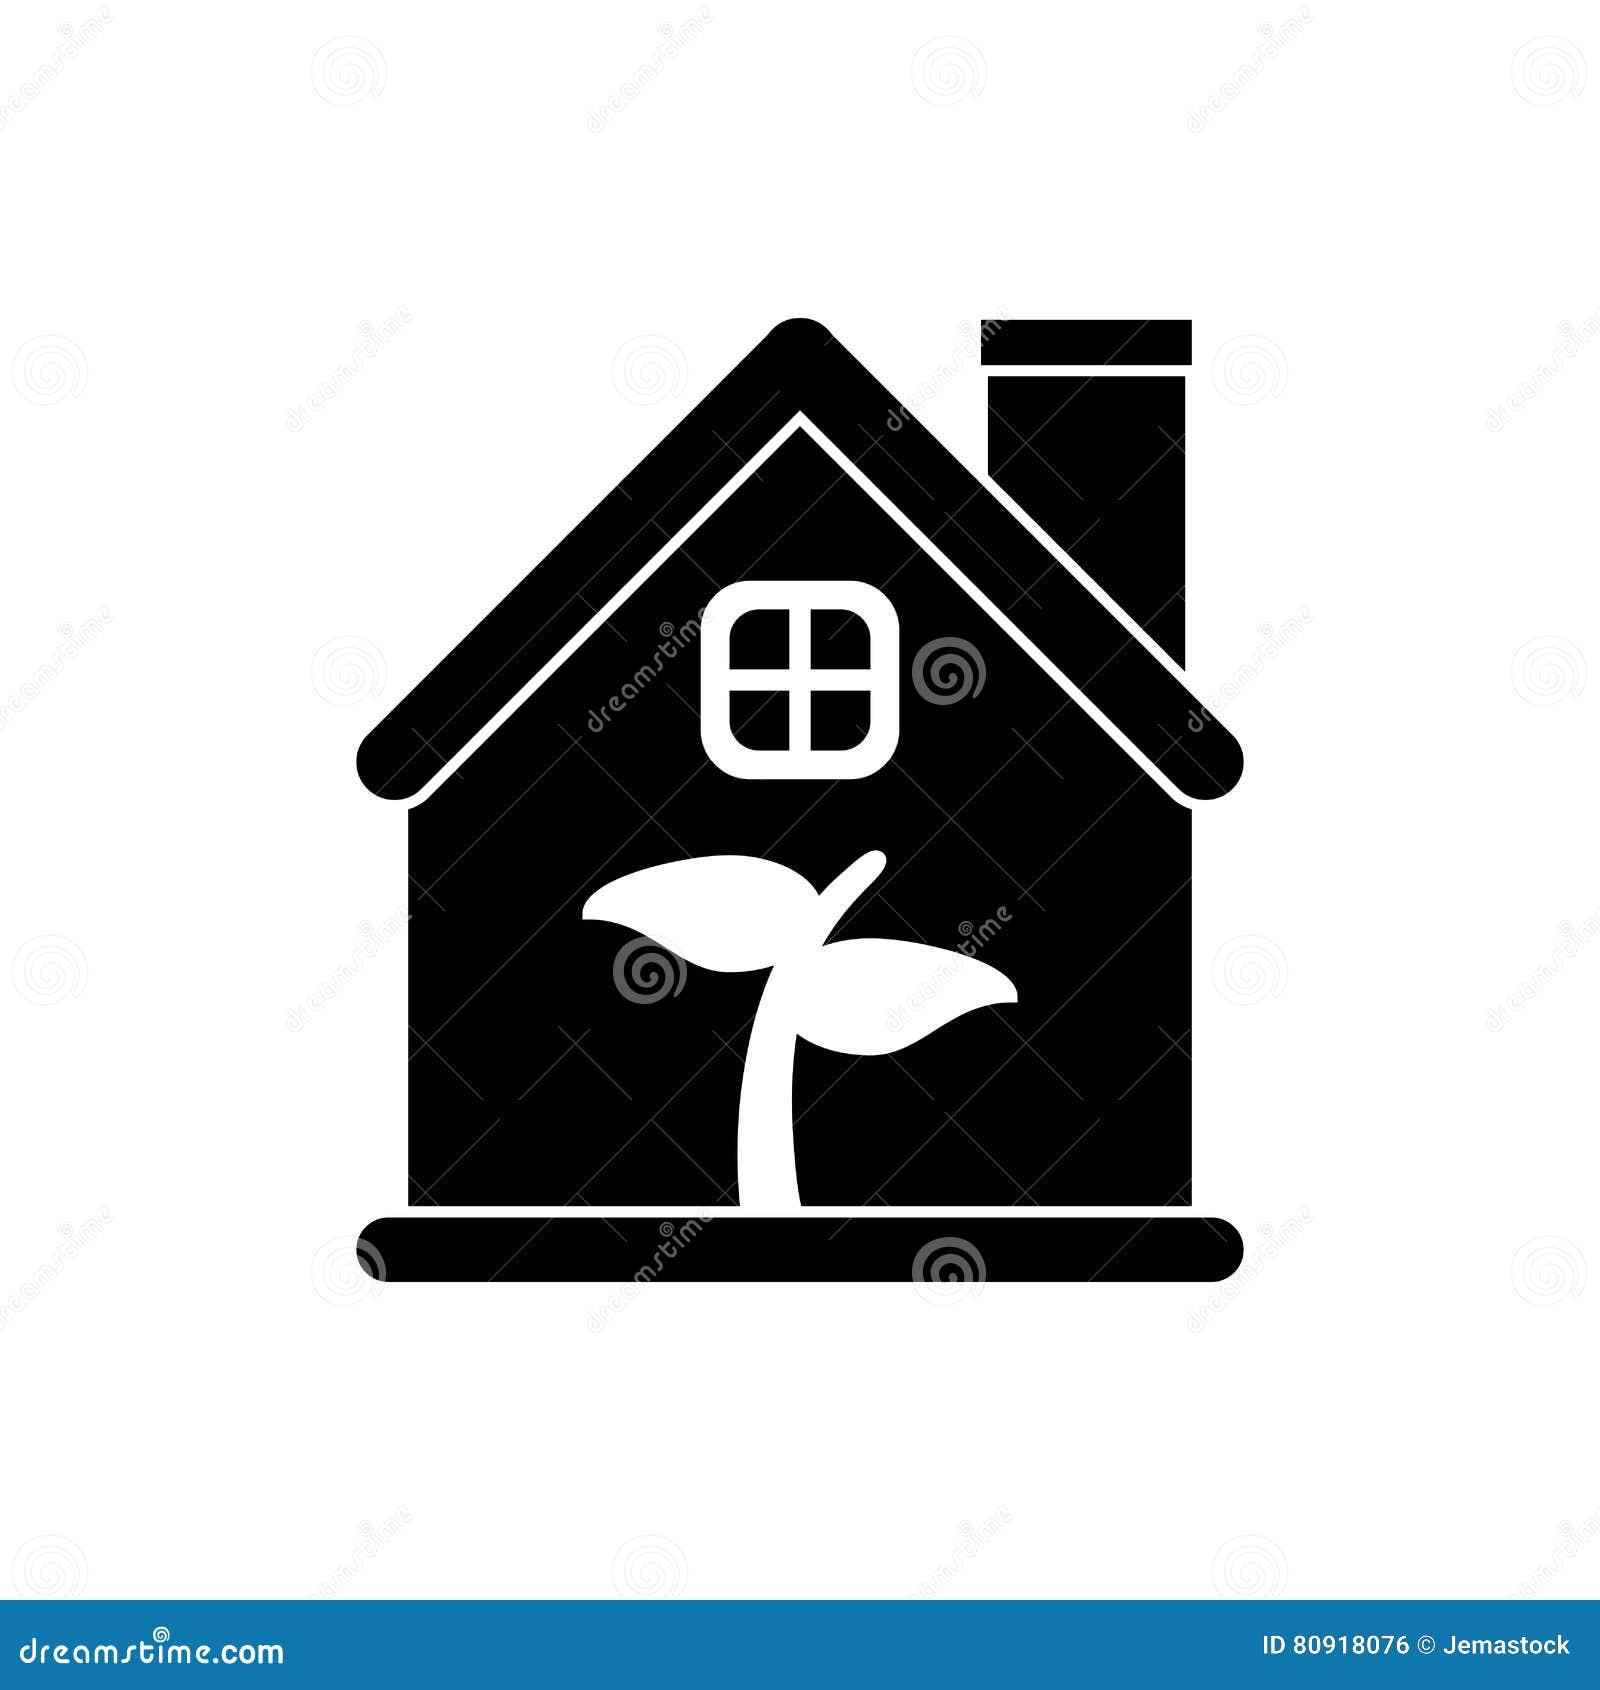 Magnificent Leaf Inside House Design Stock Vector Illustration Of House Download Free Architecture Designs Scobabritishbridgeorg